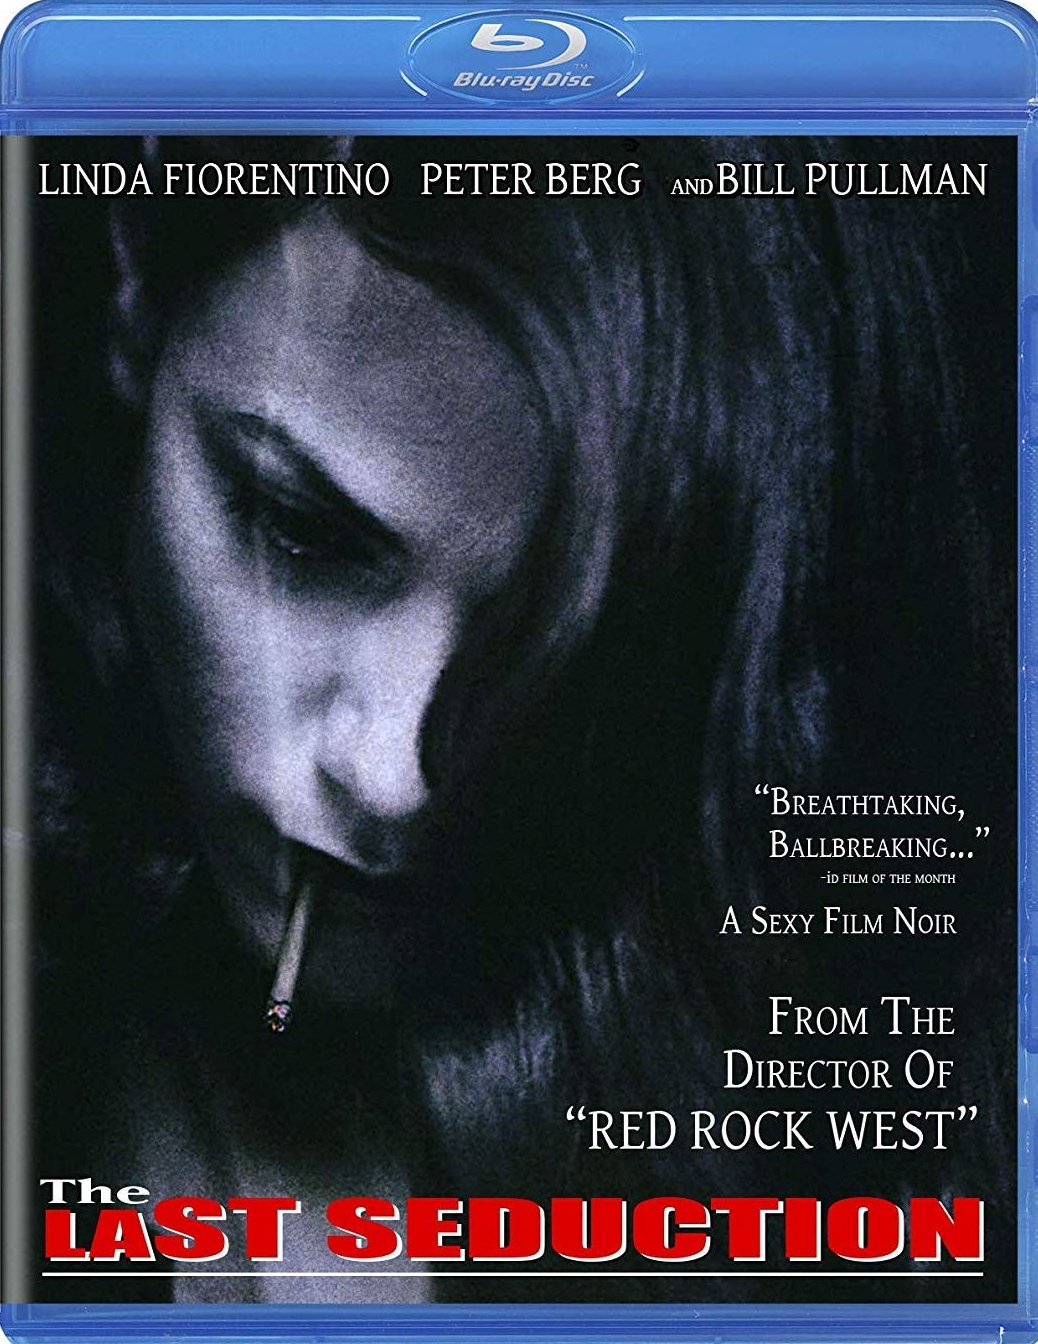 The Last Seduction Blu-ray - Buy at Amazon